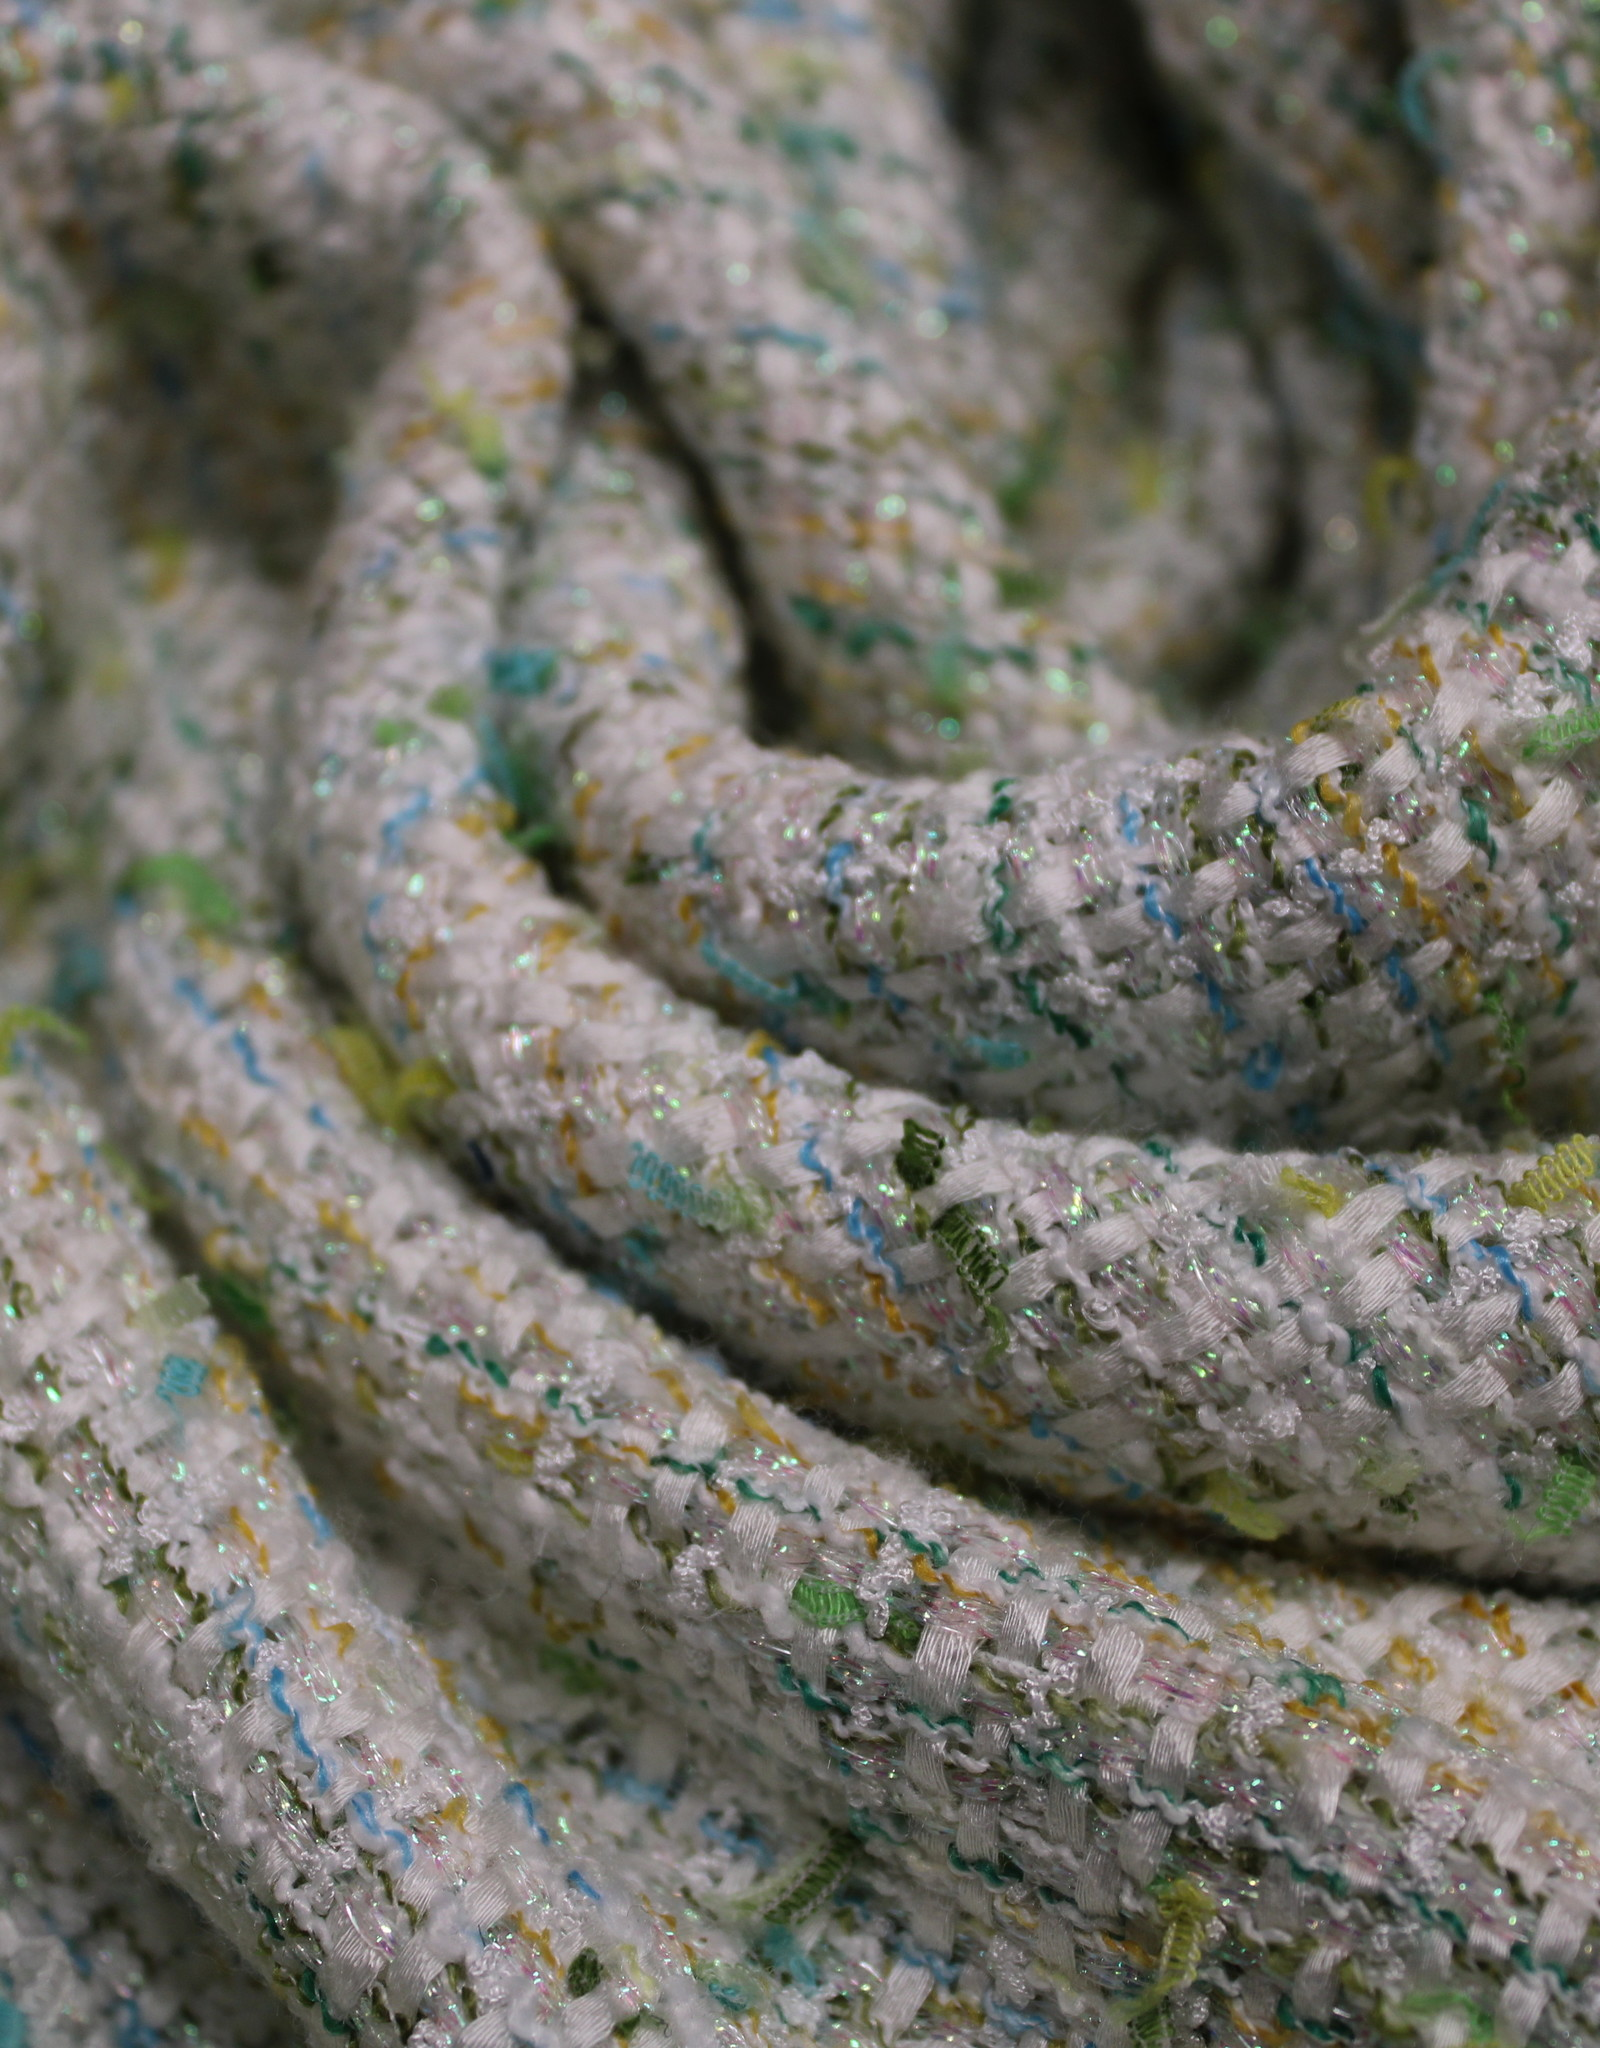 Jacquard chanel glitter groen-geel-turqoise tweed